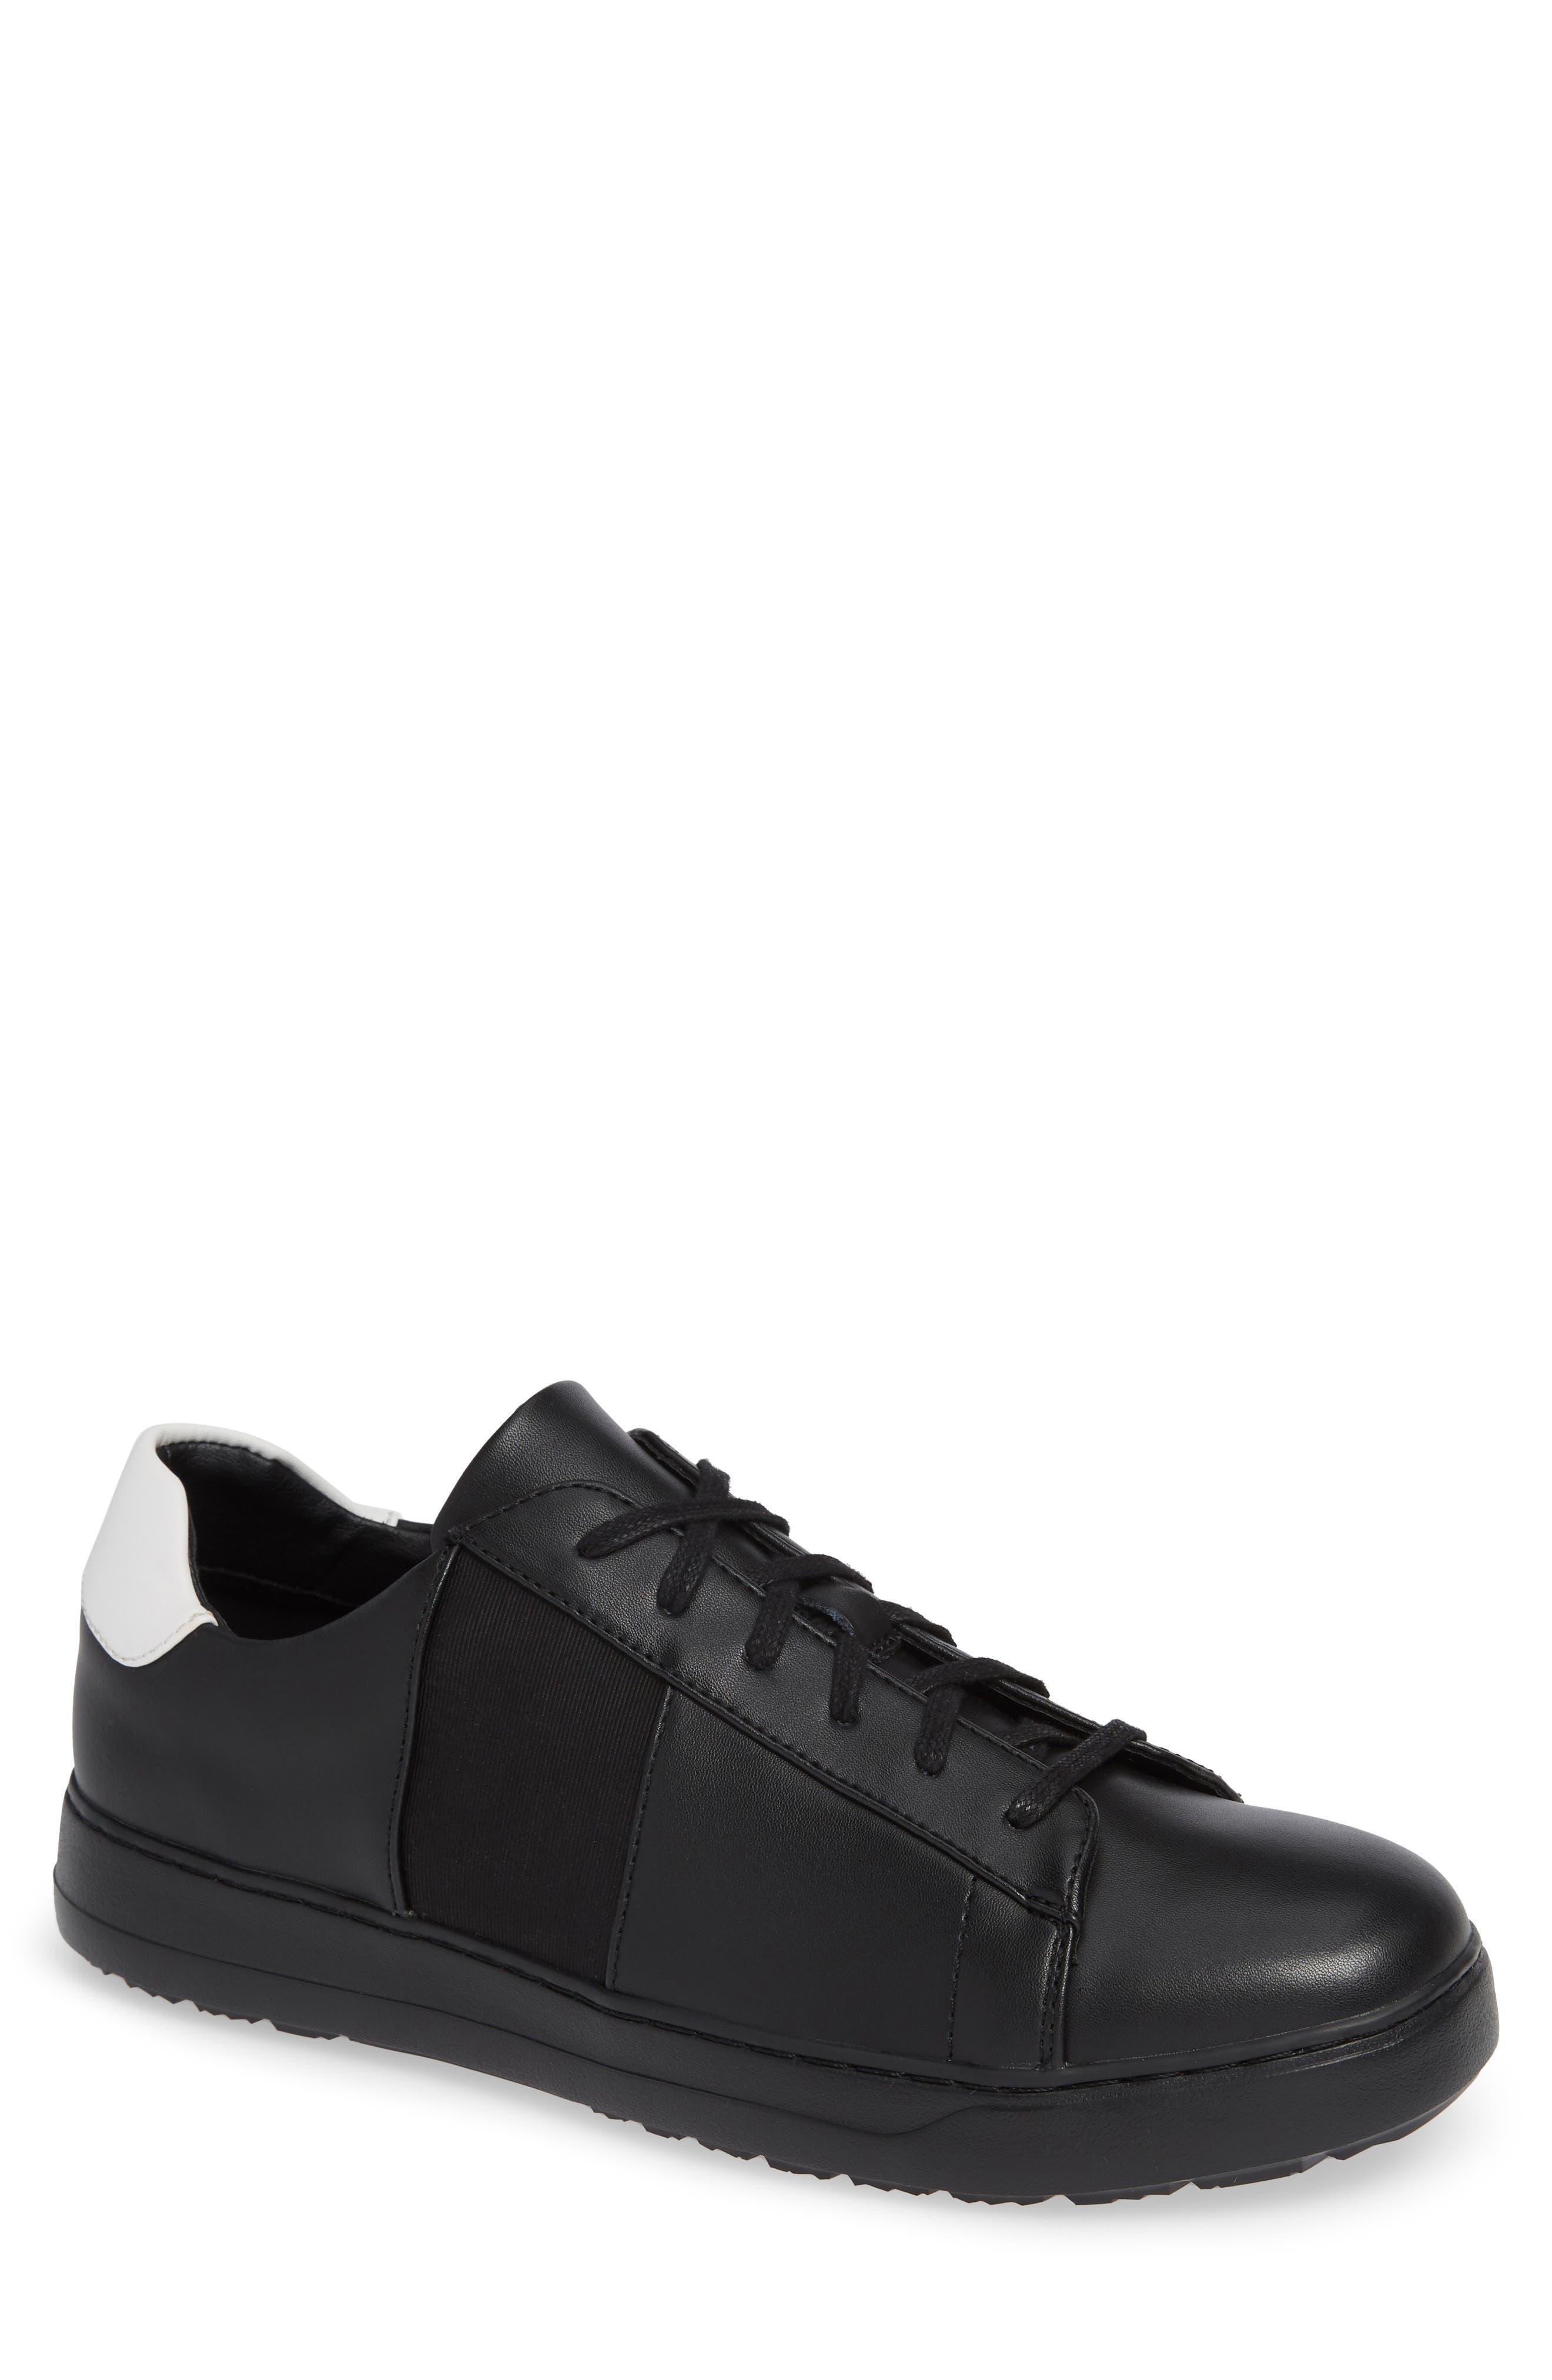 Sammy 2 Sneaker,                         Main,                         color, BLACK LEATHER